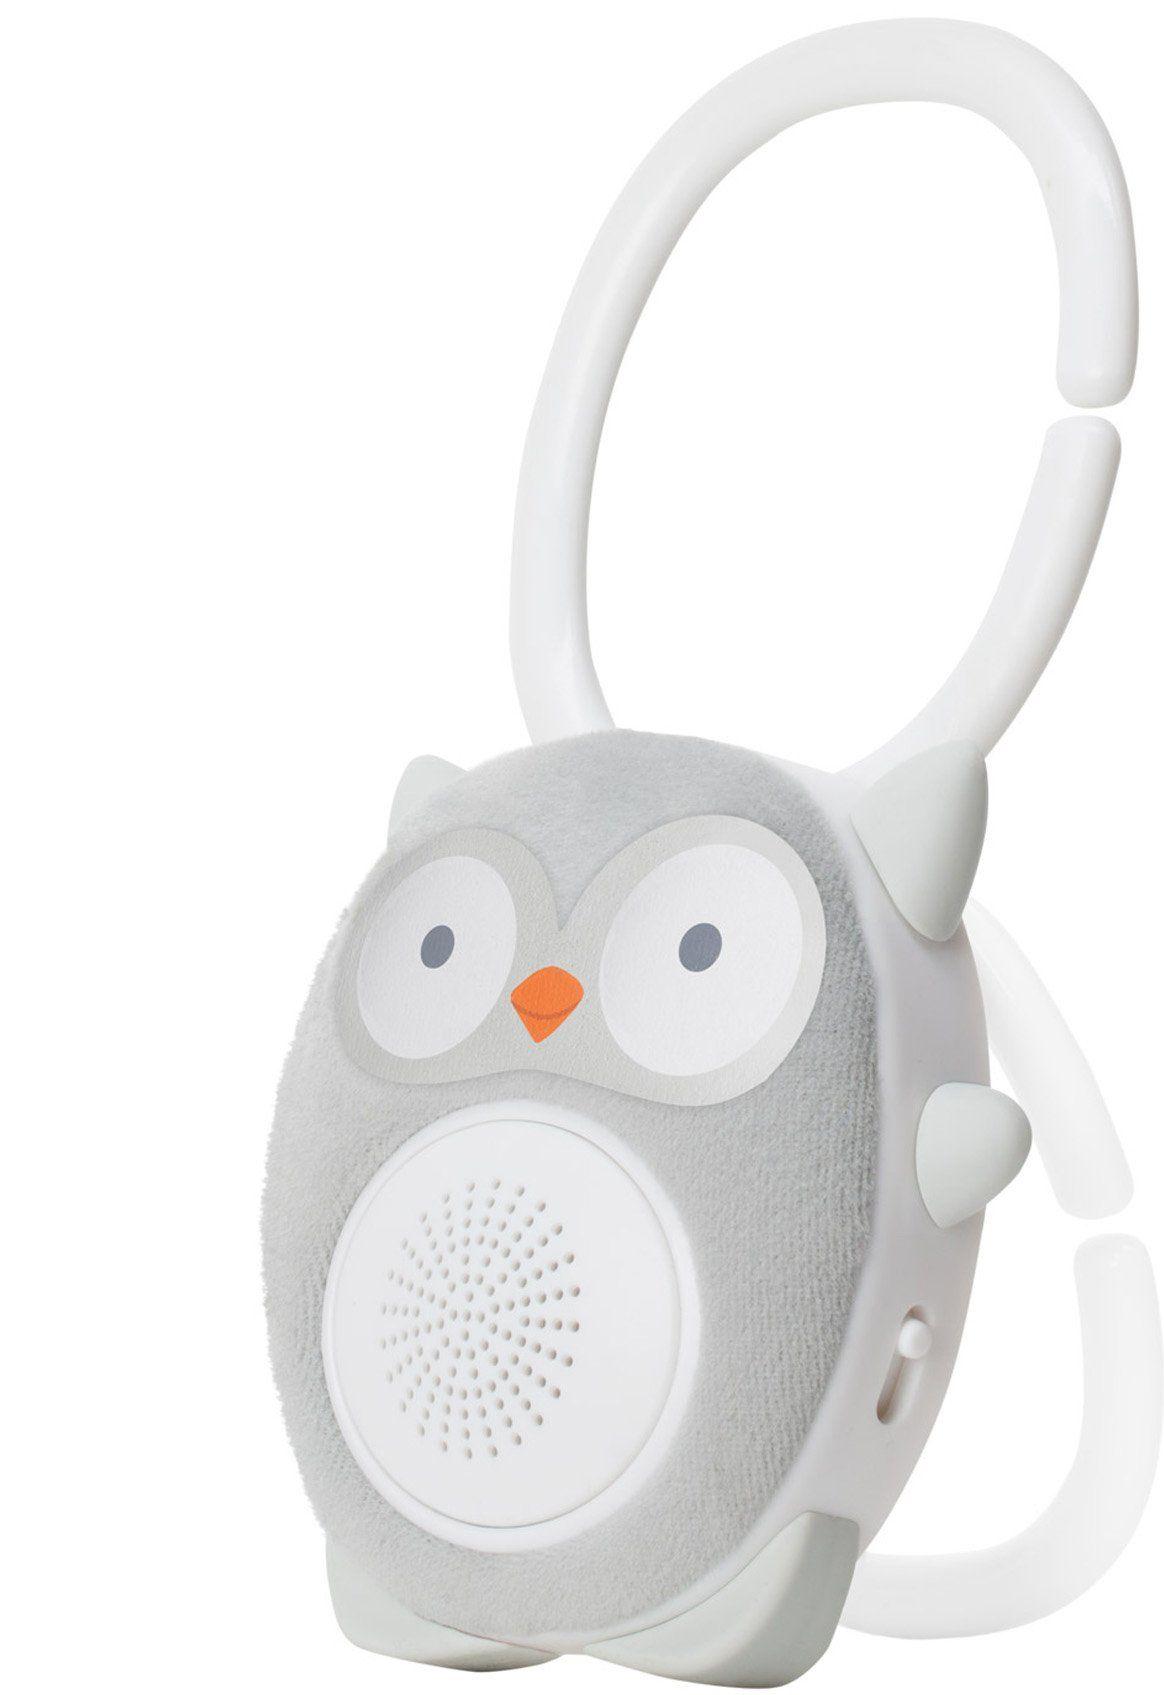 SoundBub White Noise Machine and Bluetooth Speaker